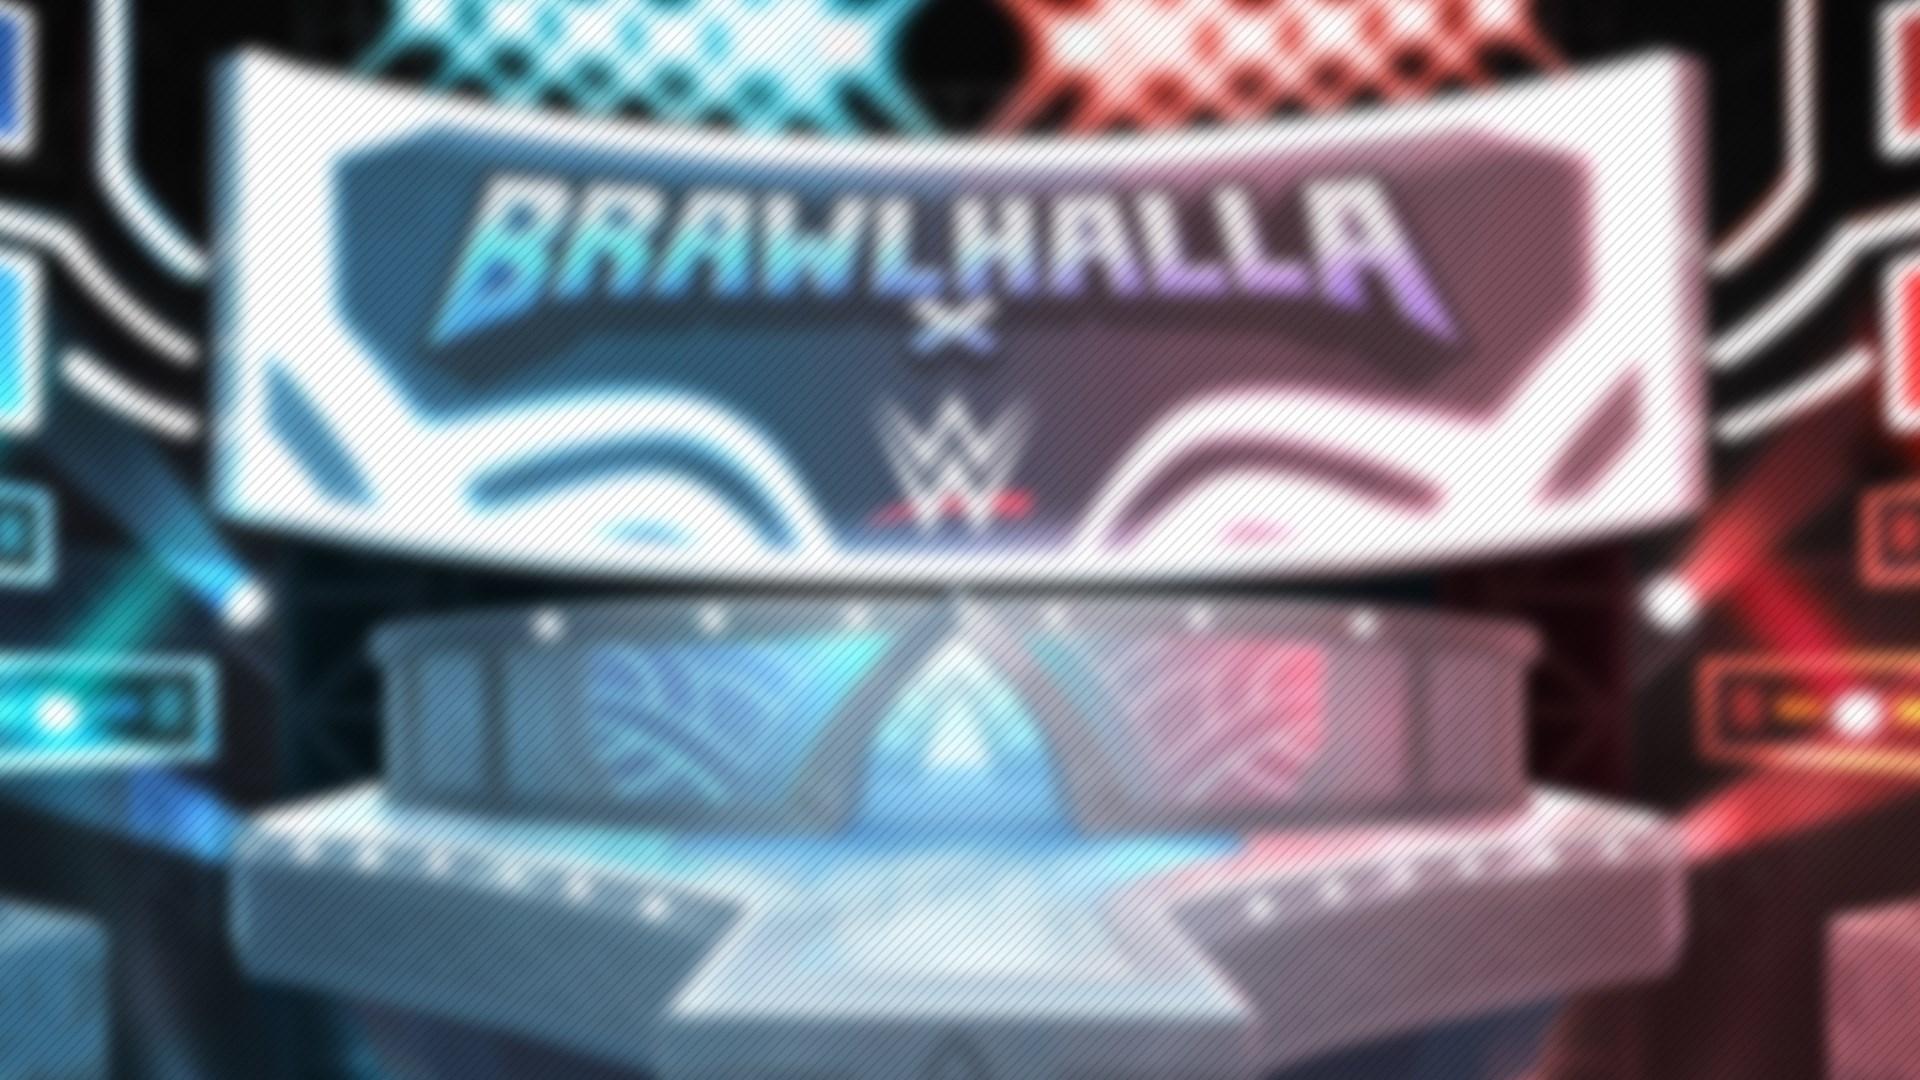 Get Brawlhalla - Microsoft Store